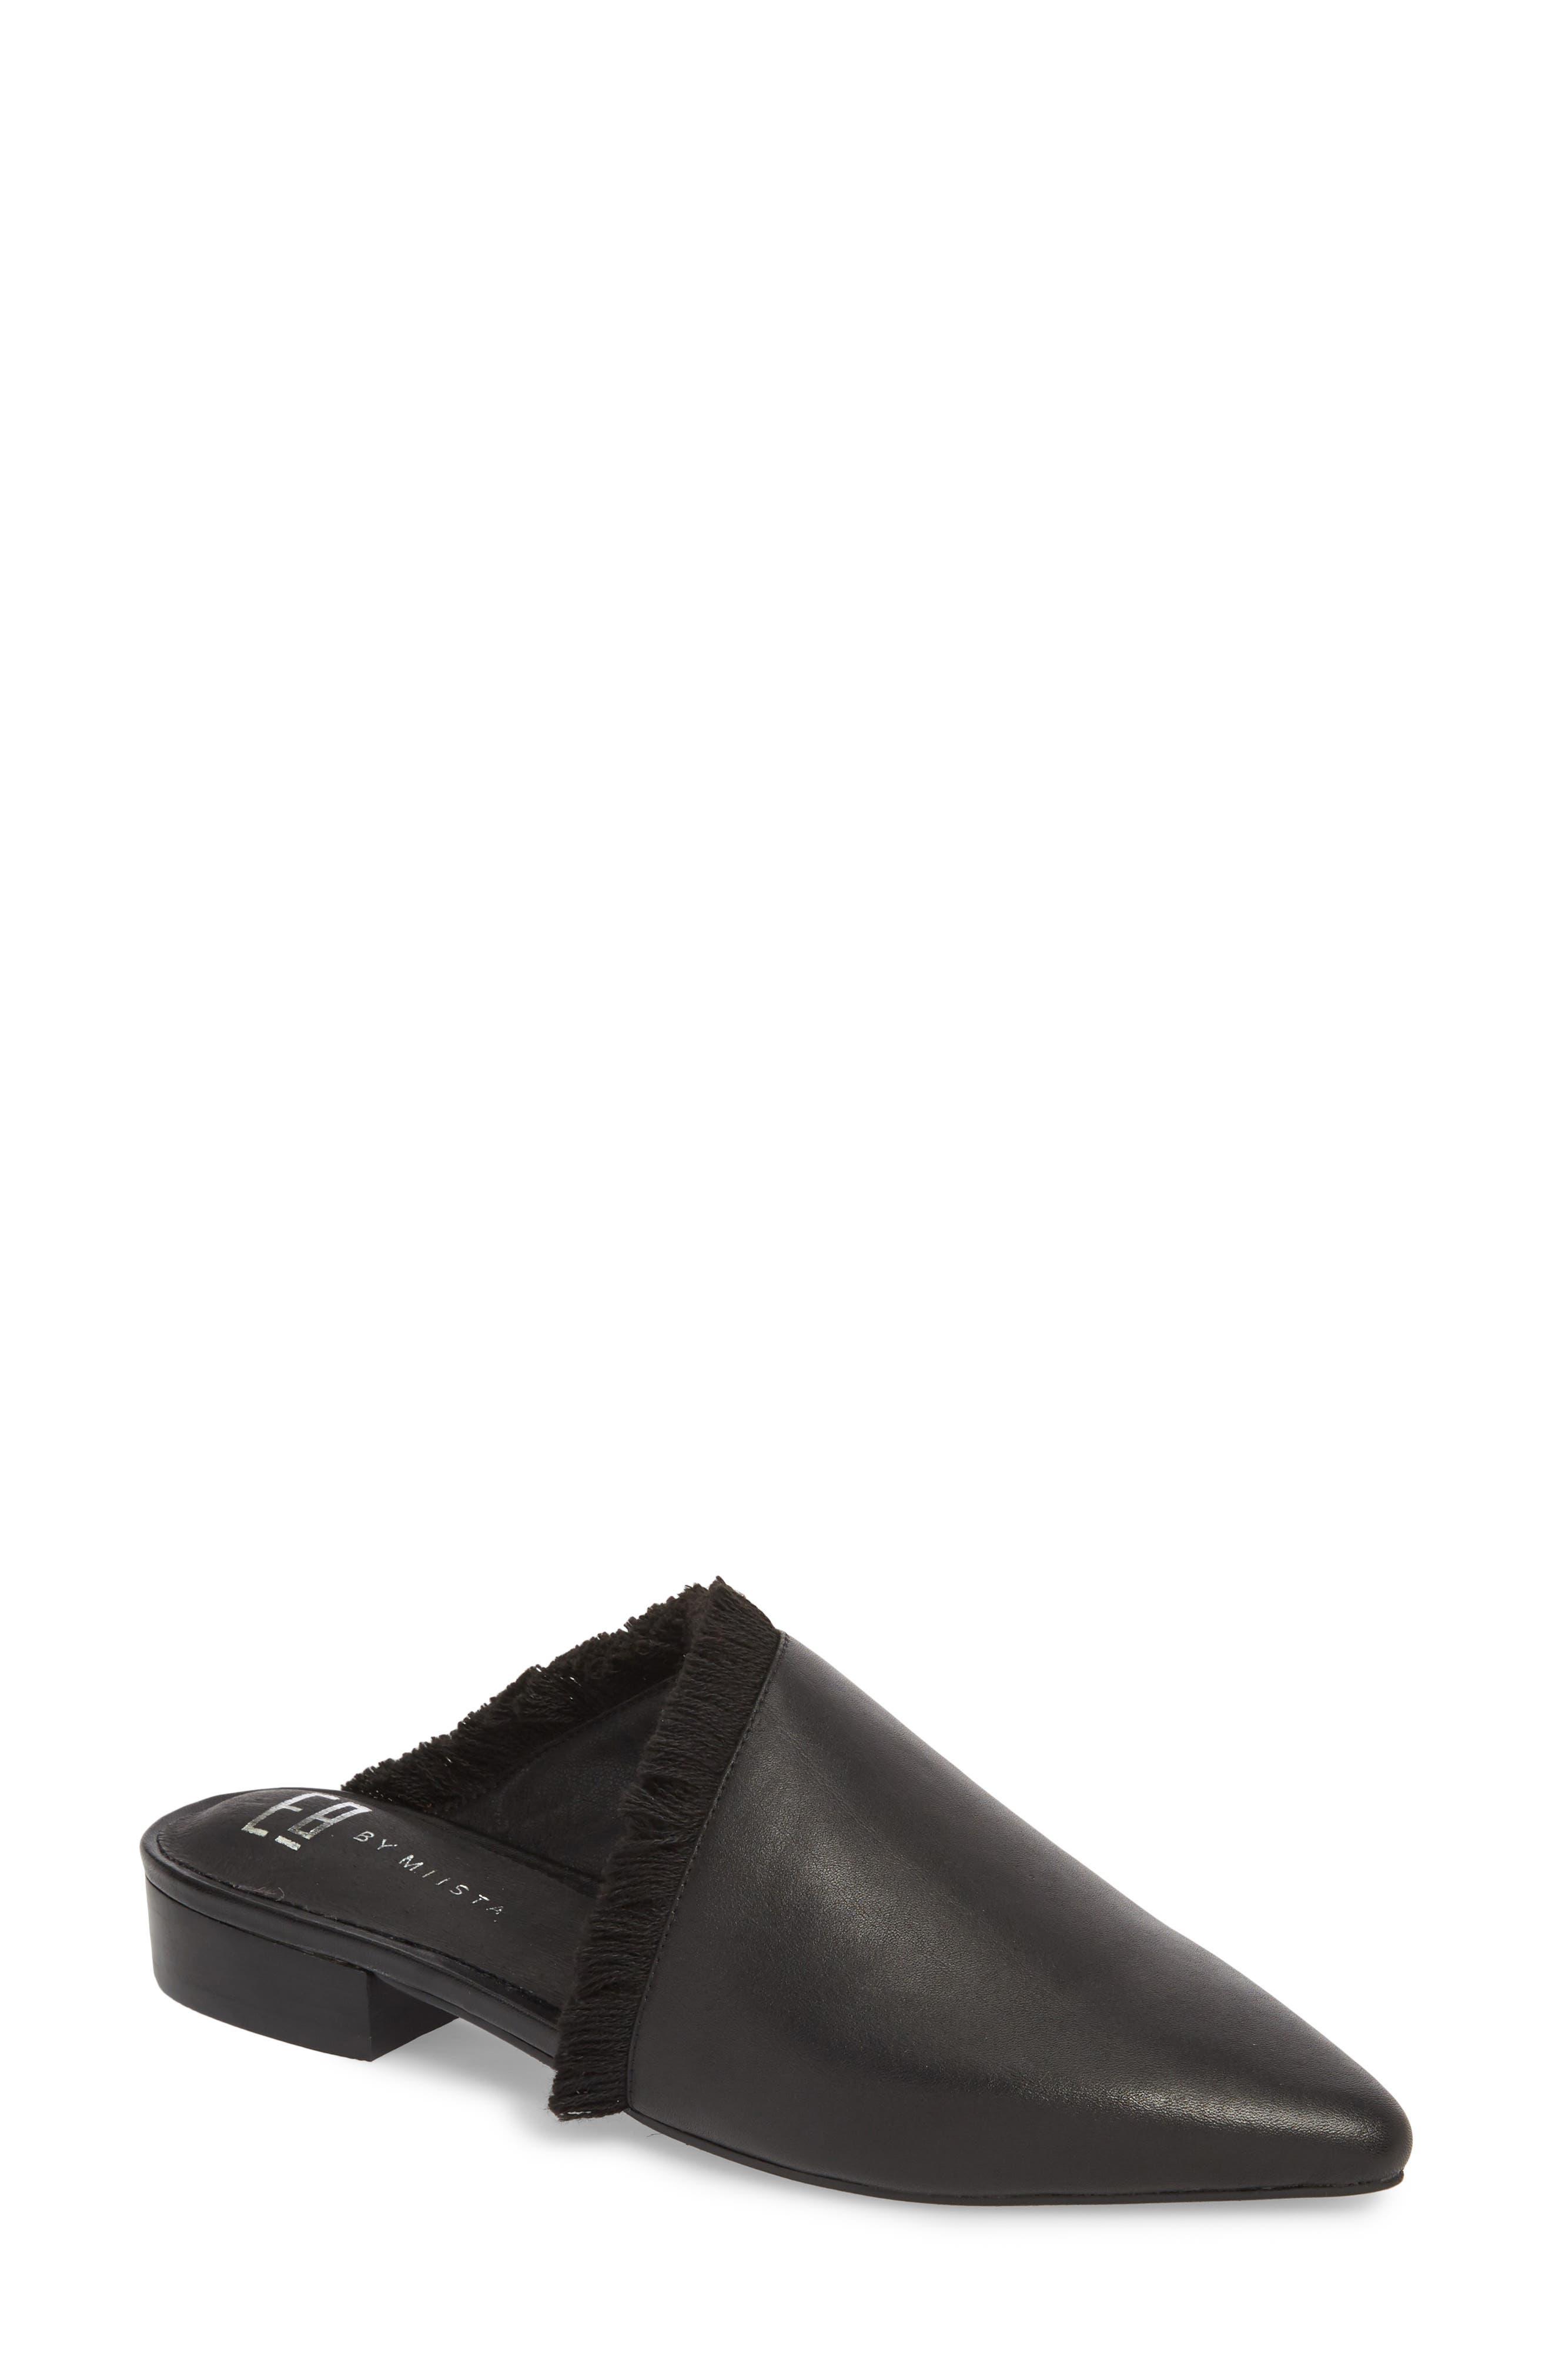 Leroy Asymmetrical Flat Mule,                             Main thumbnail 1, color,                             Black Leather